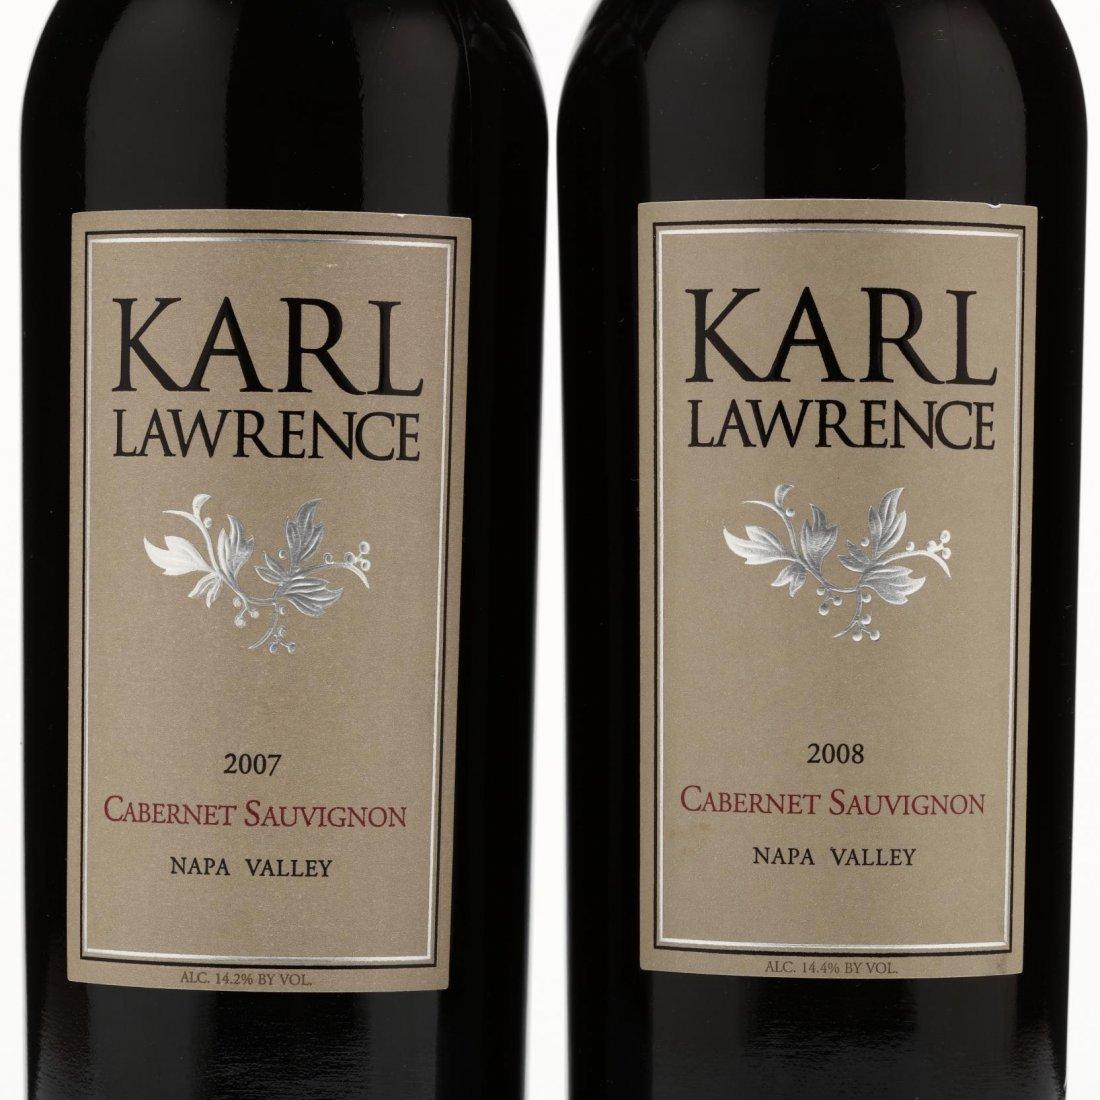 2007 & 2008 Karl Lawrence - 2